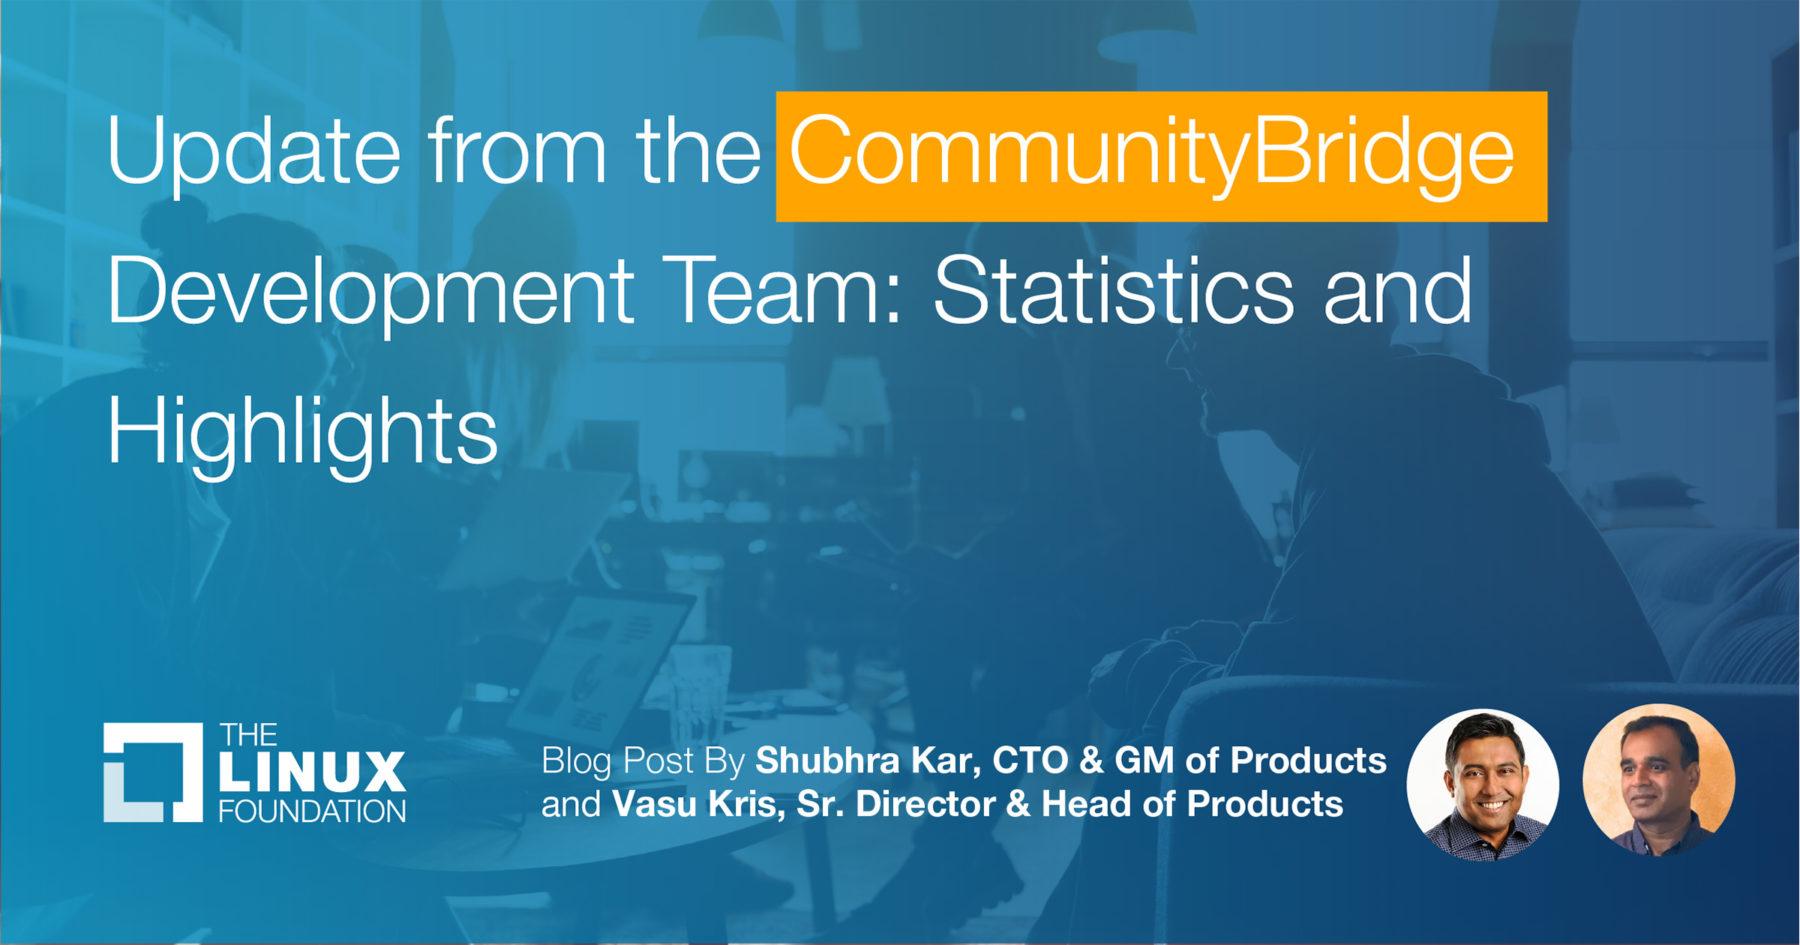 Update from the CommunityBridge Development Team: Statistics and Highlights